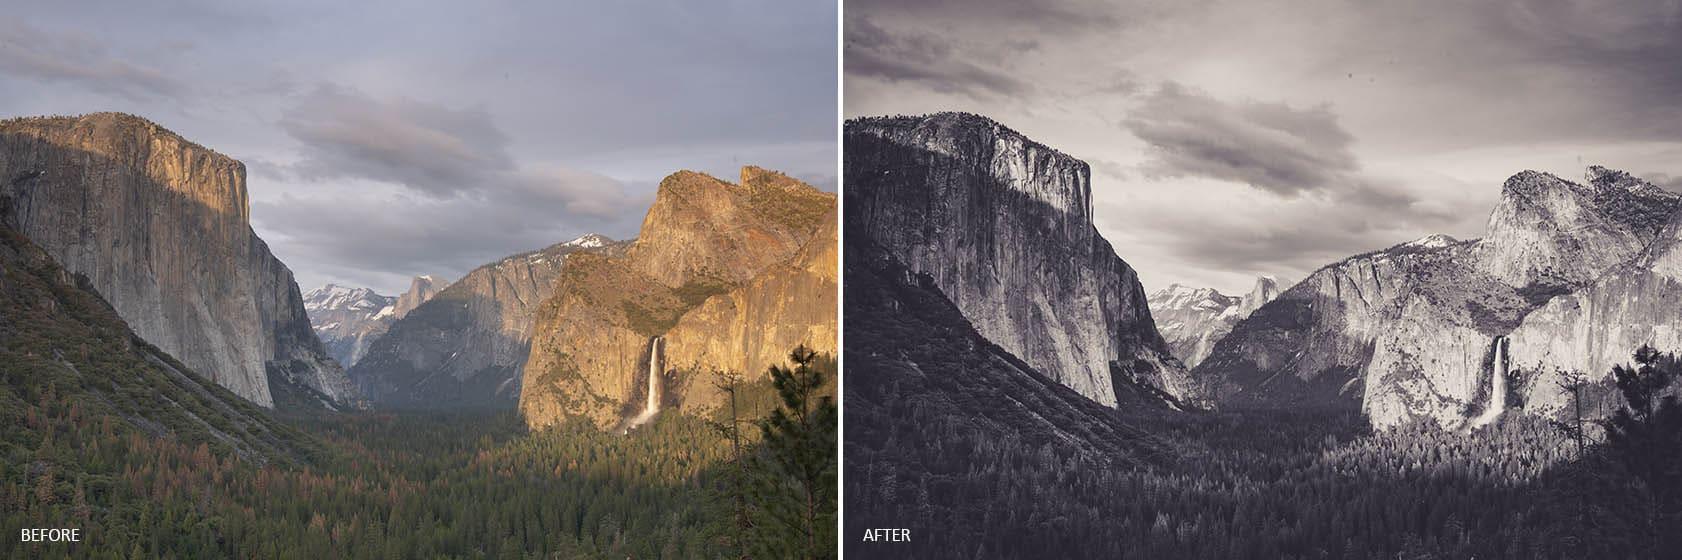 Adobe-Lightroom-preset-World-0002